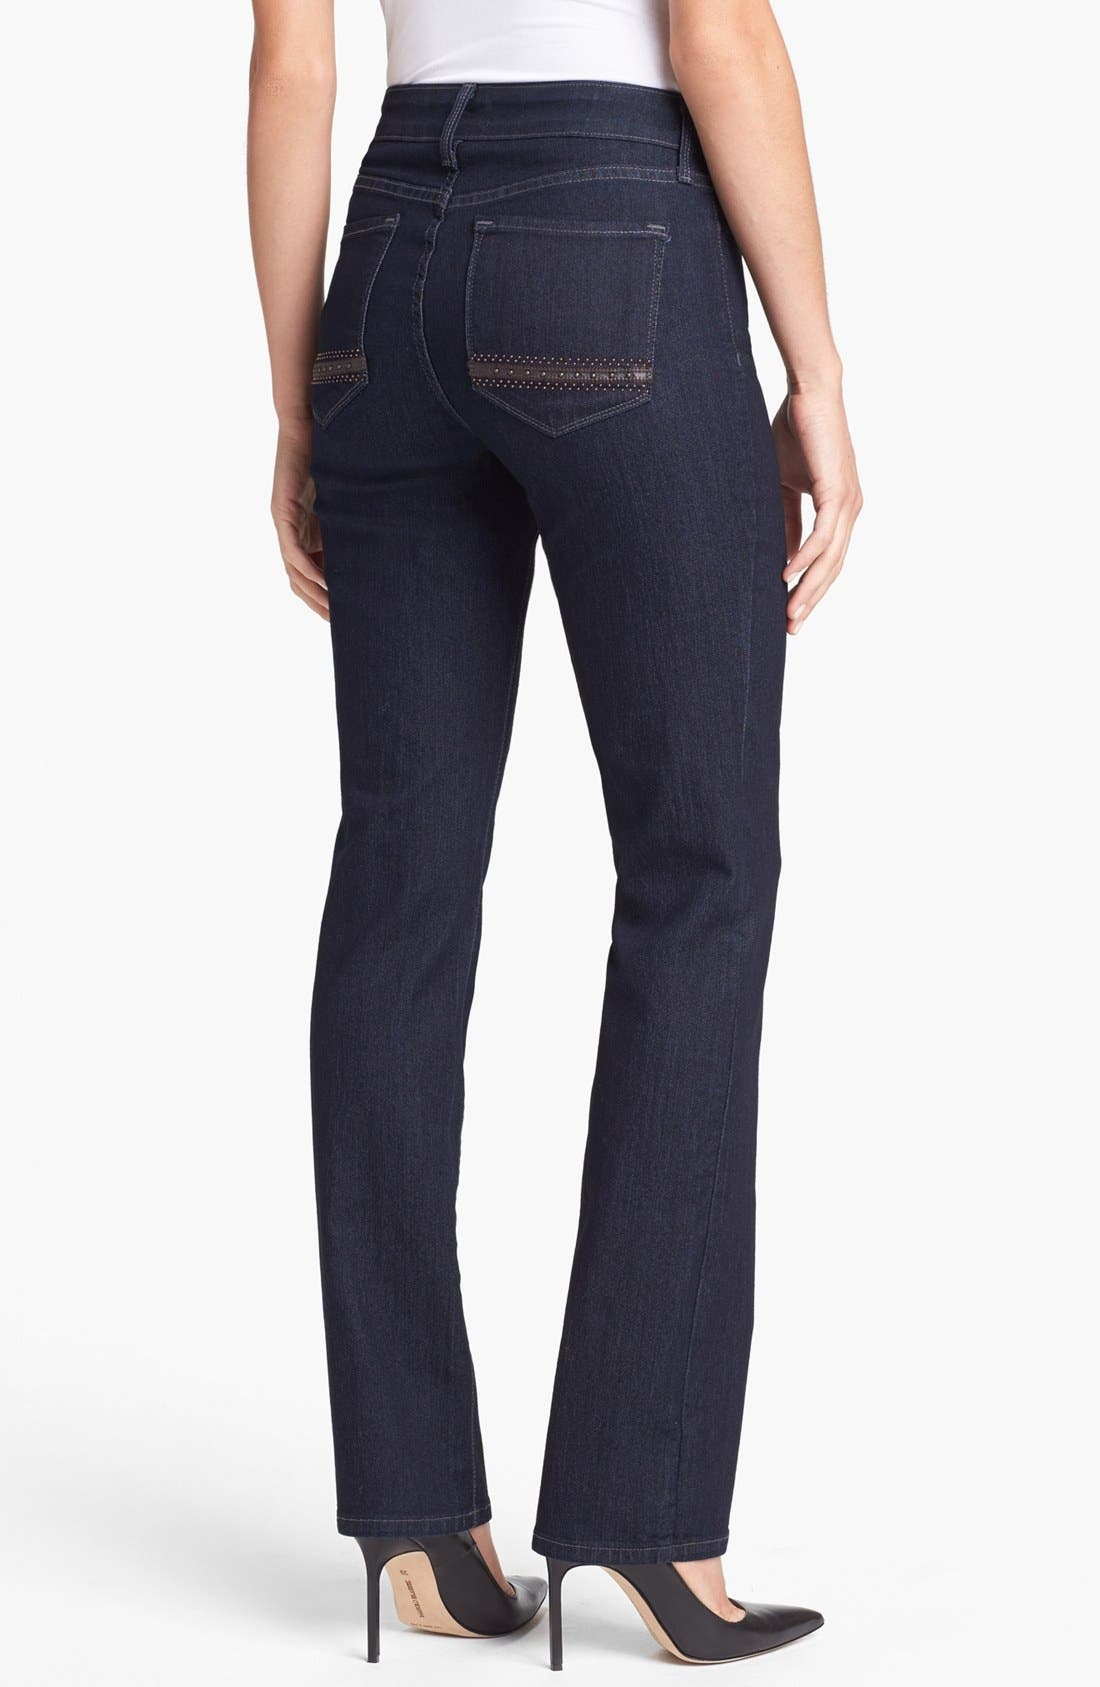 Alternate Image 3  - NYDJ 'Marilyn' Embellished Pocket Stretch Straight Leg Jeans (Dark Enzyme) (Regular & Petite)